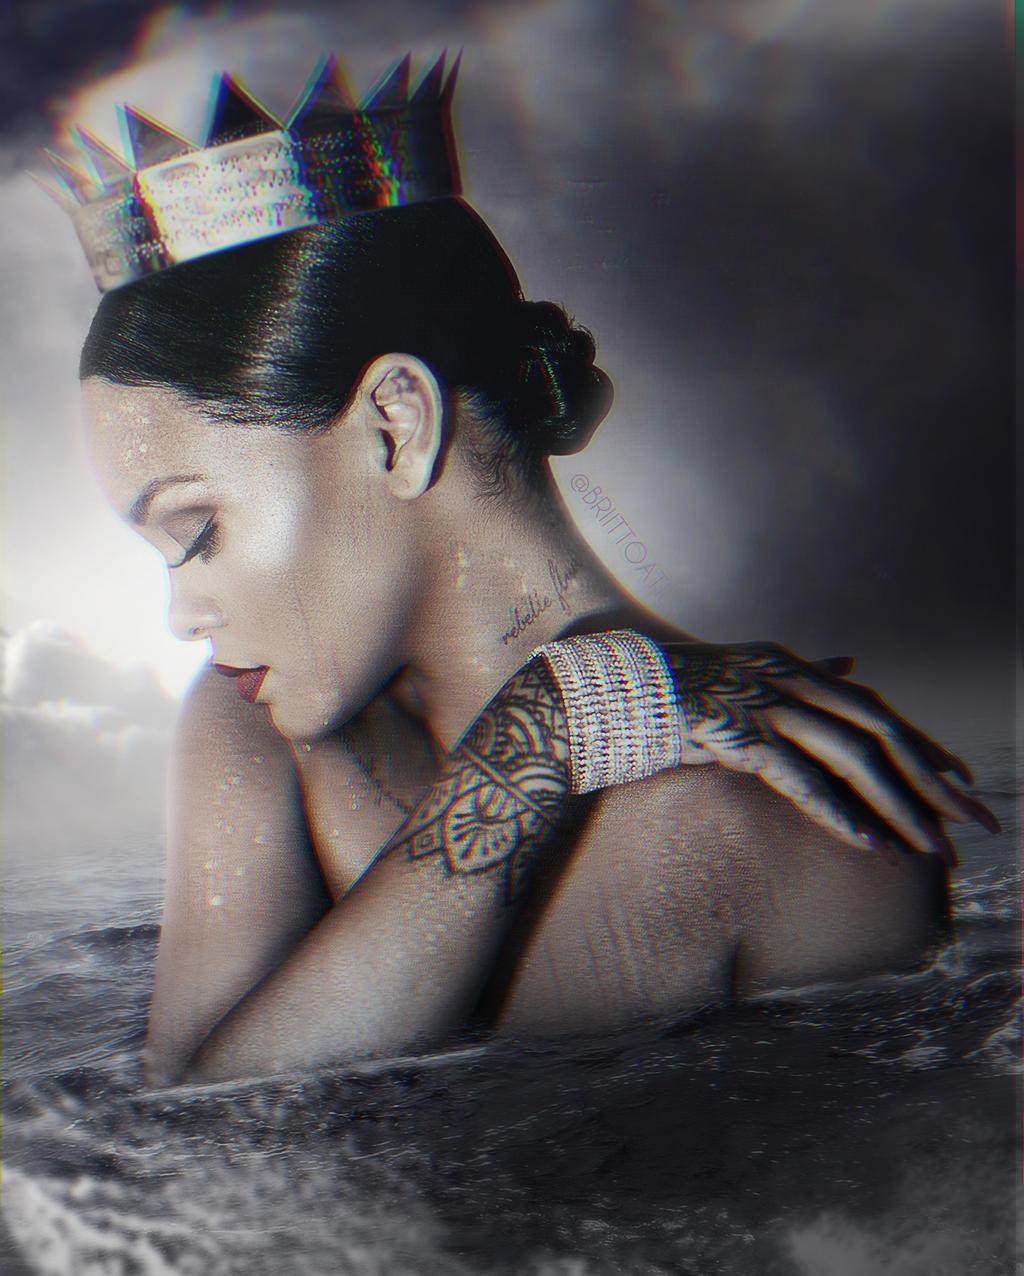 - Sea Queen - by brittoatila